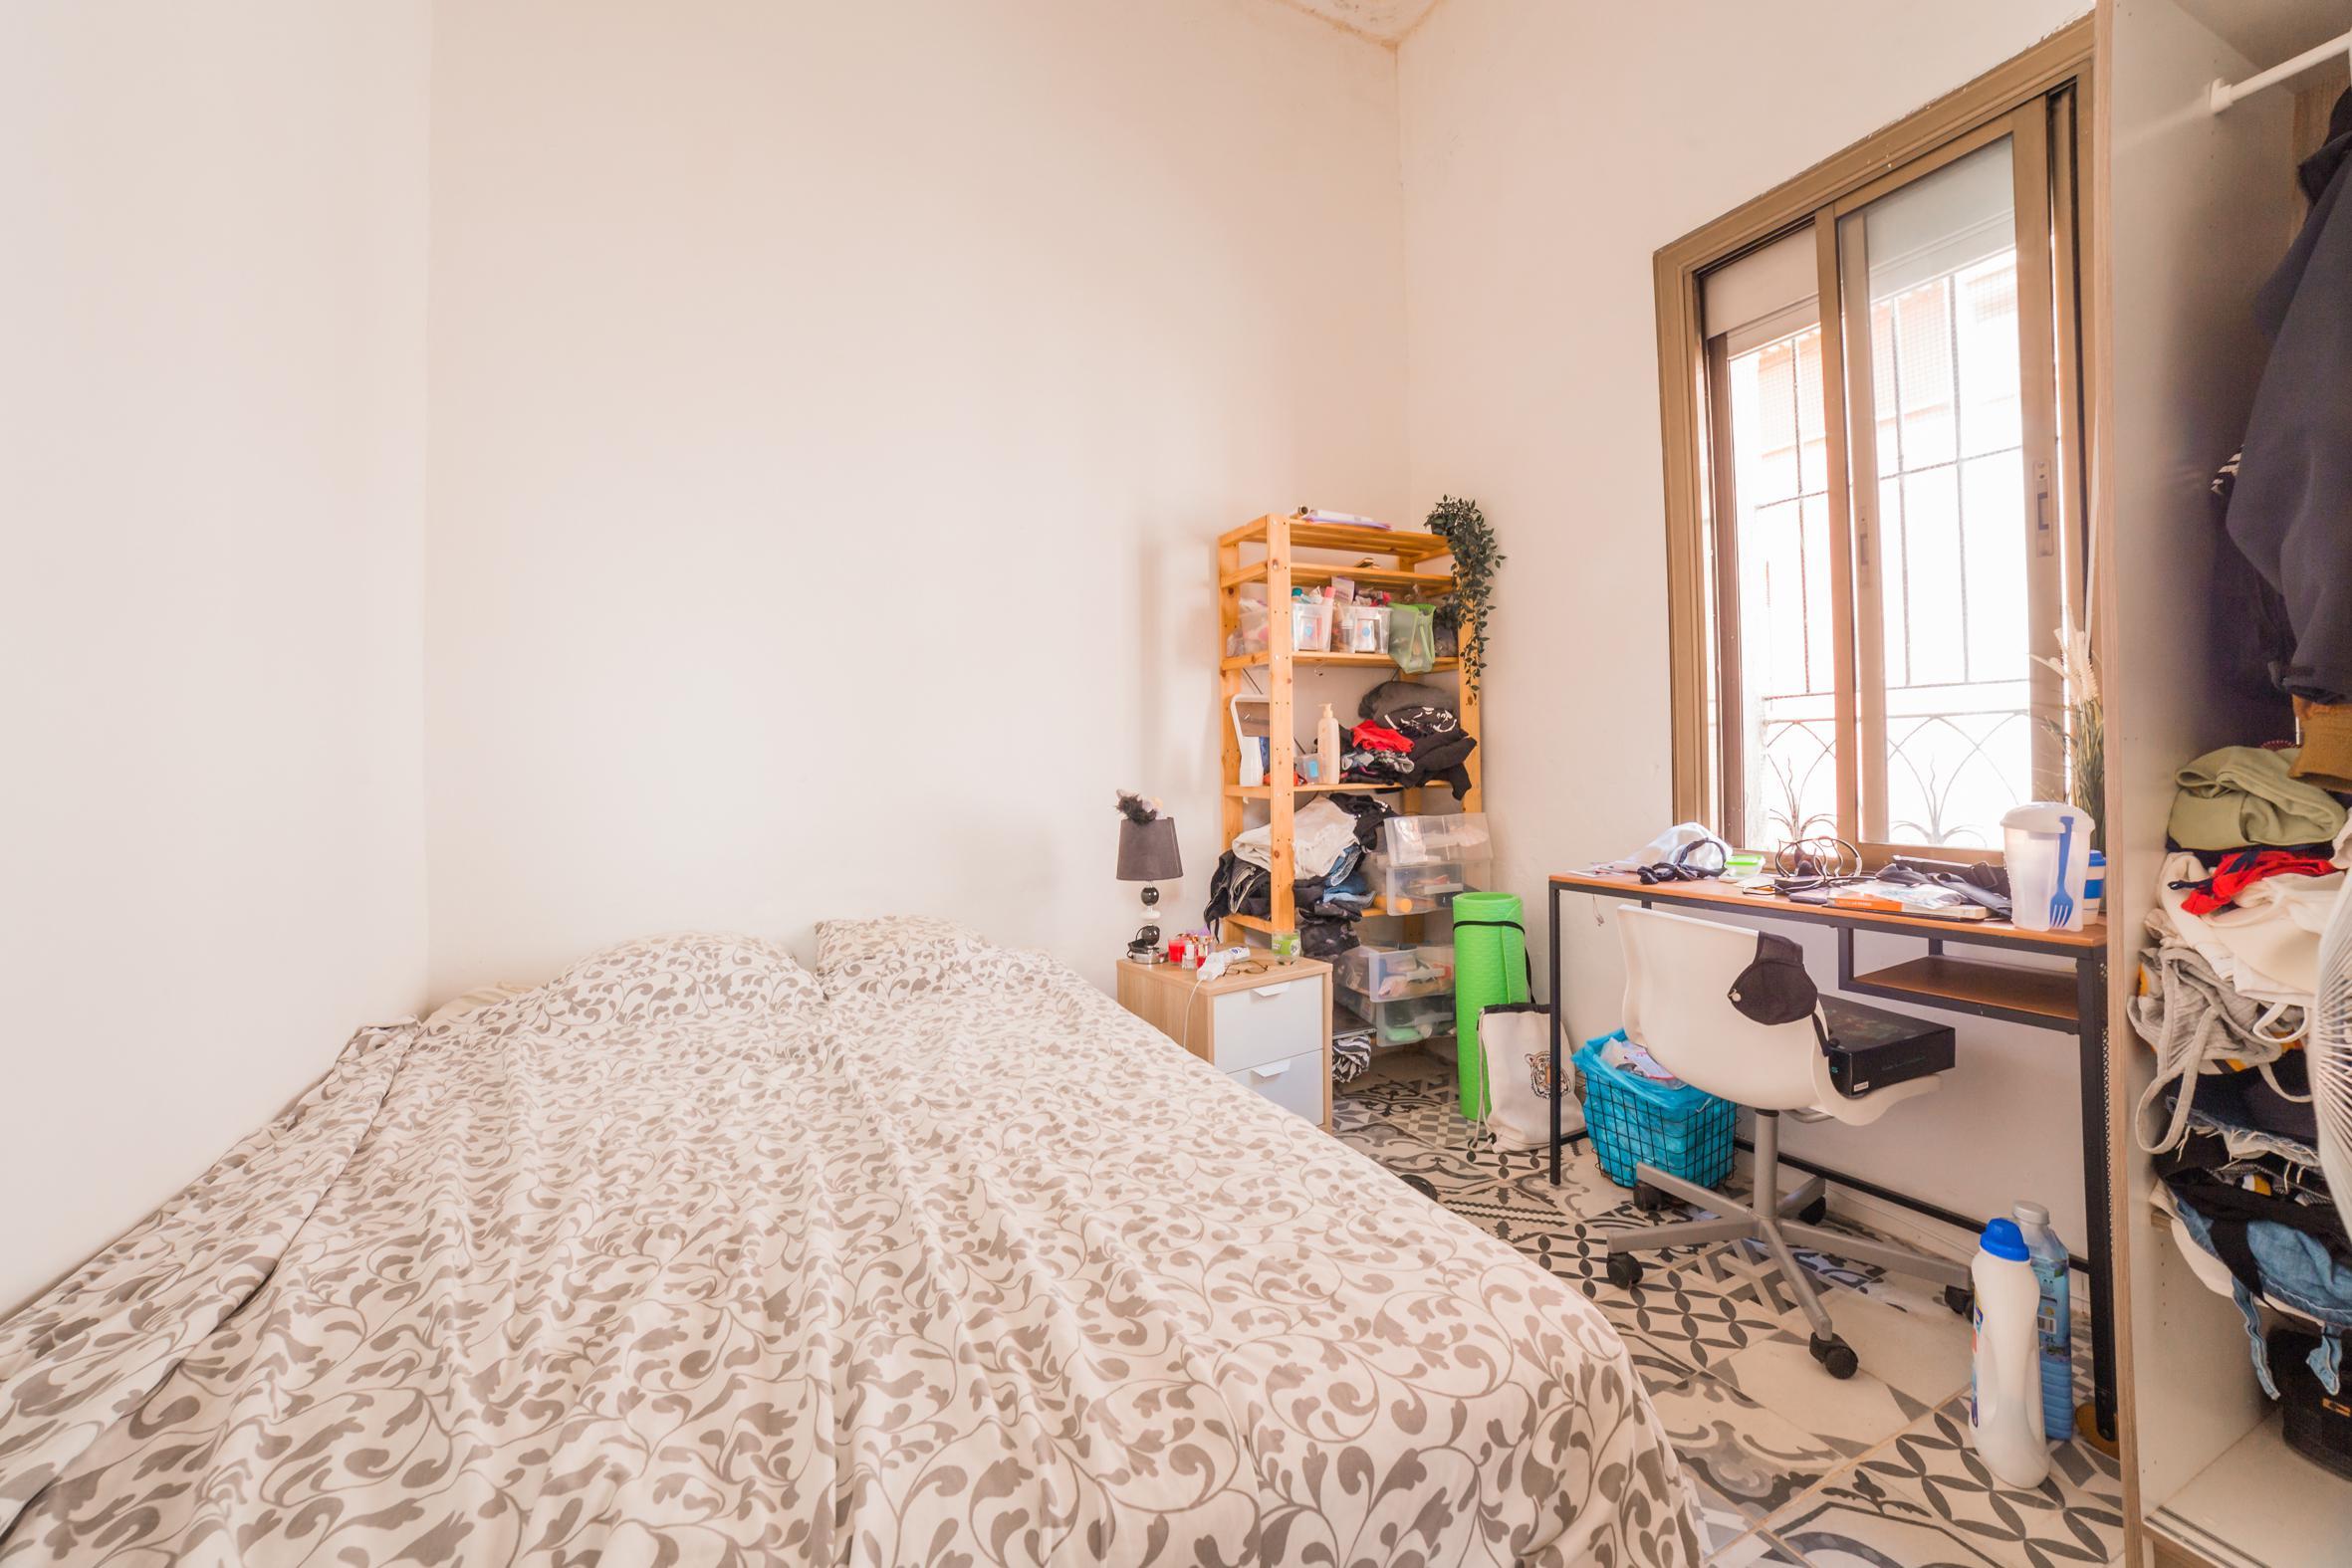 251960 House for sale in Eixample, Sagrada Familia 15